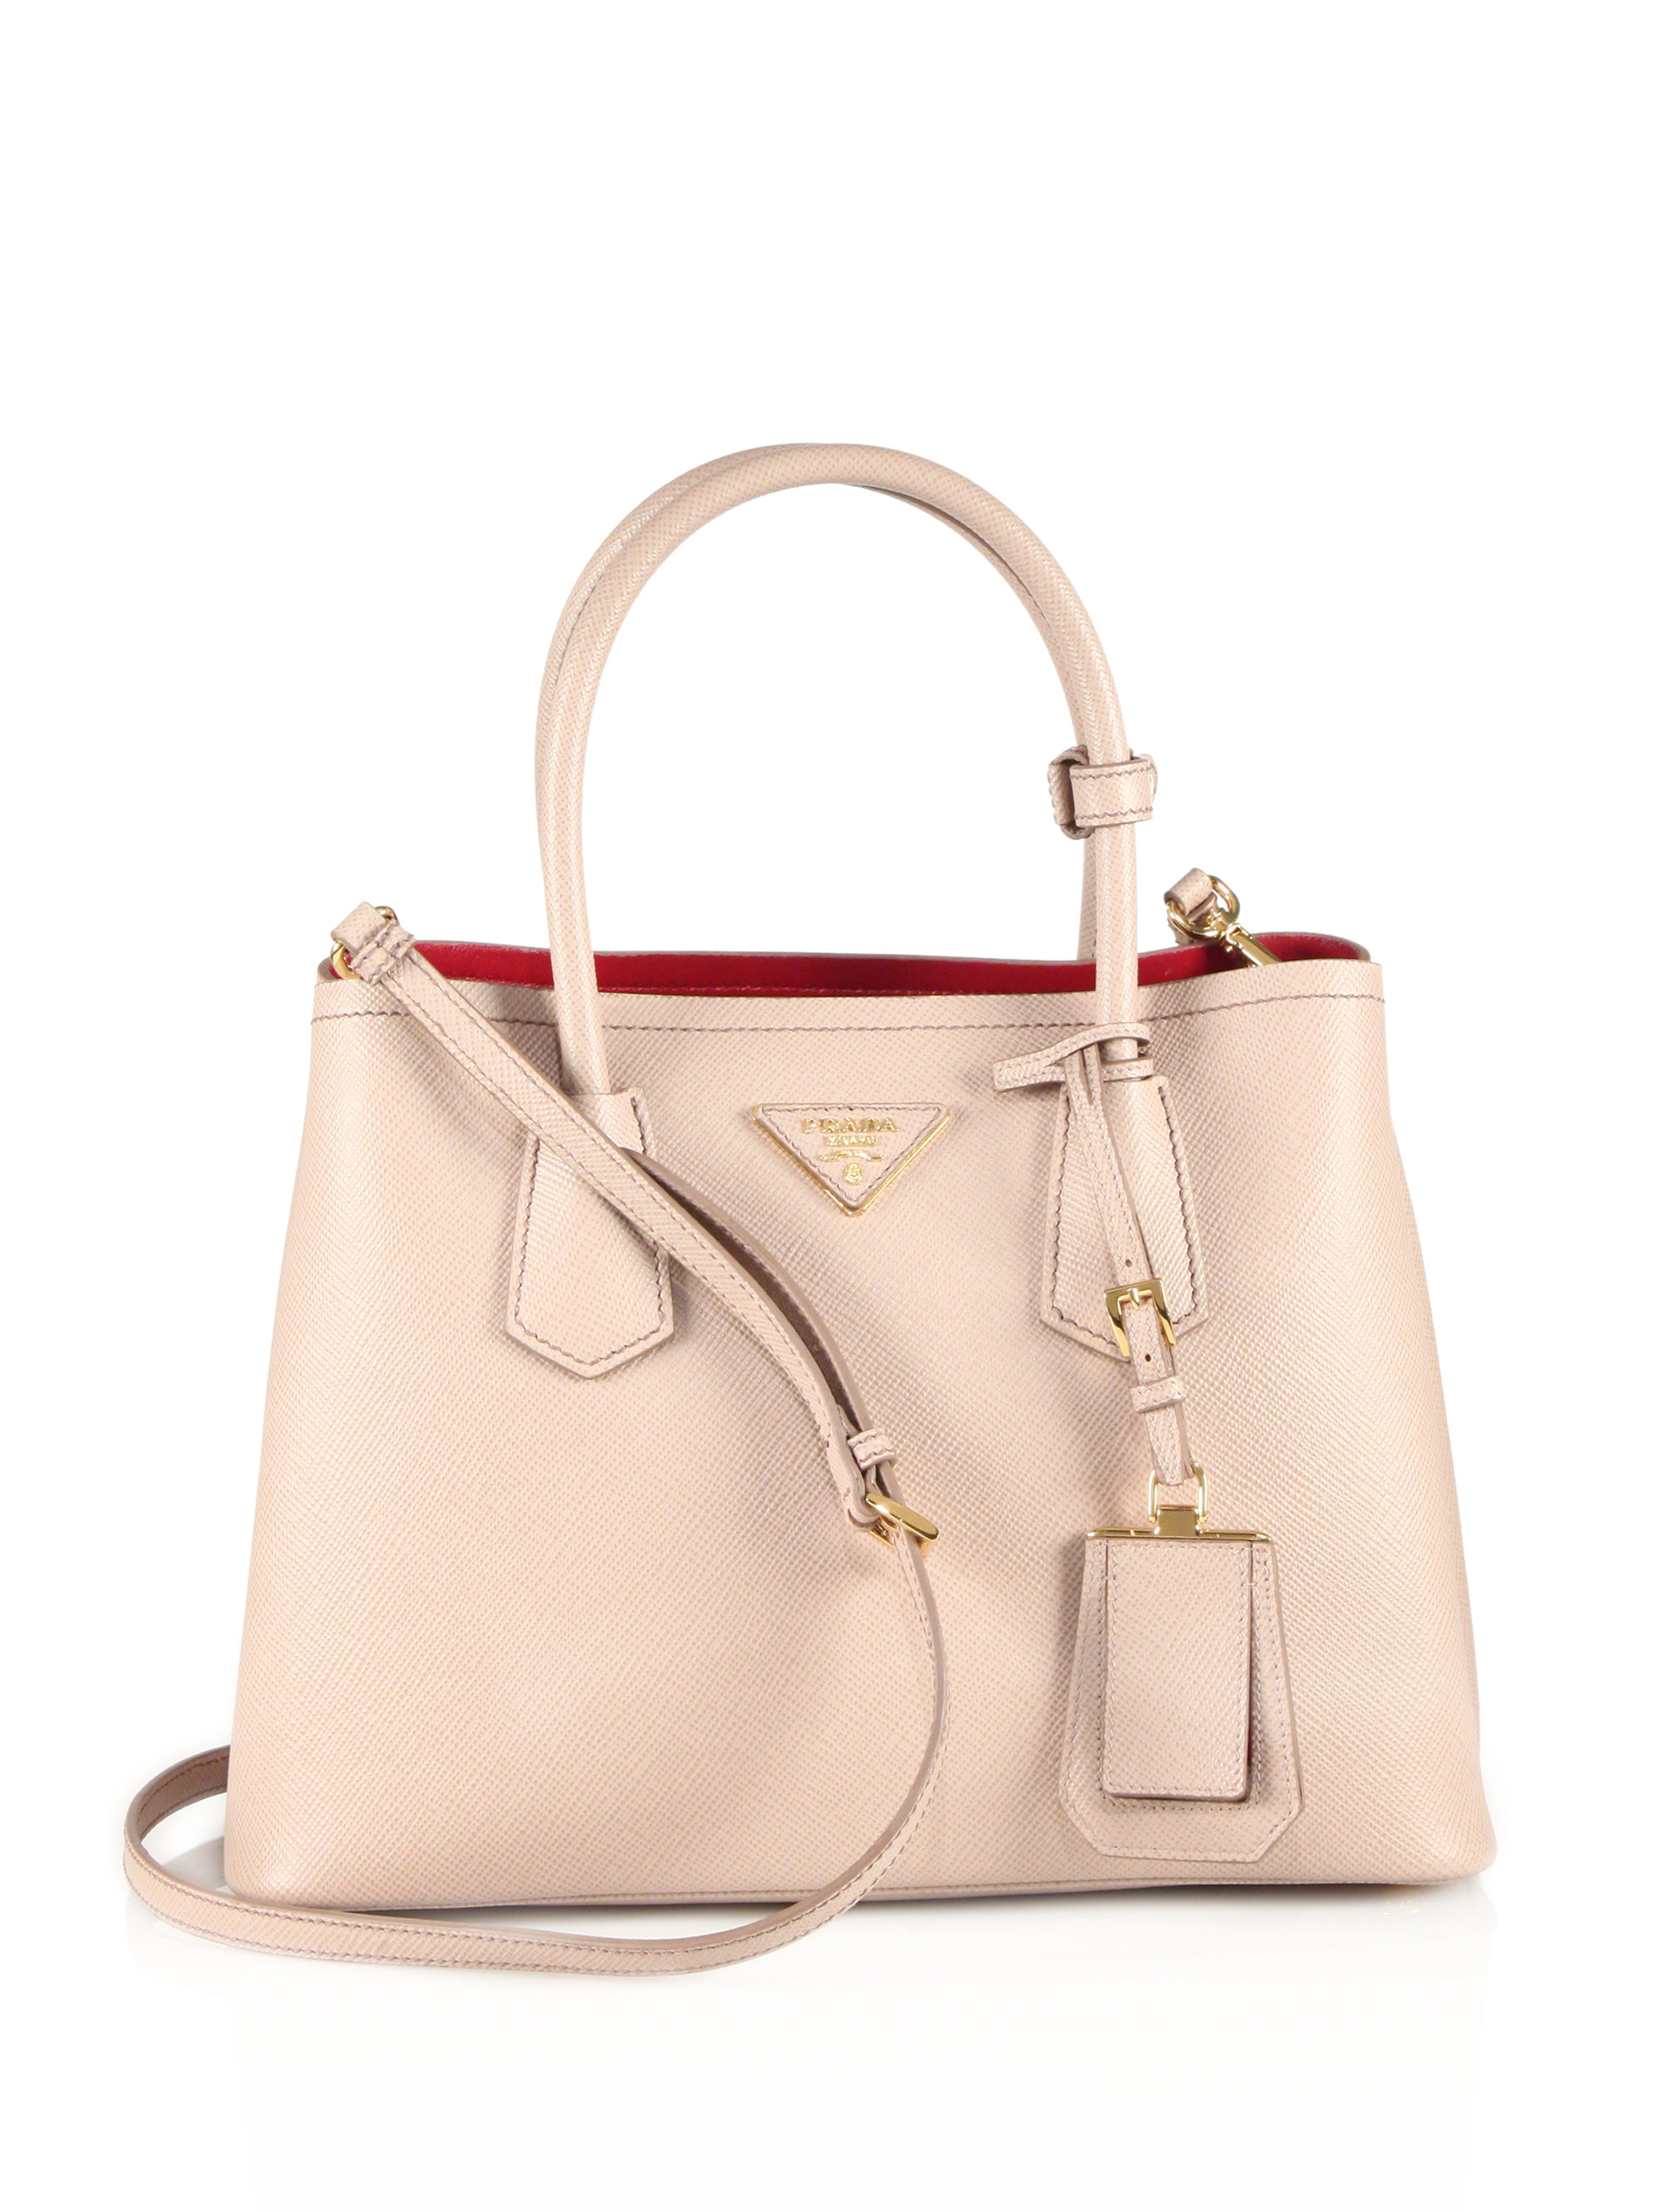 Prada Saffiano Cuir Small Double Bag in Beige (cammeo) | Lyst